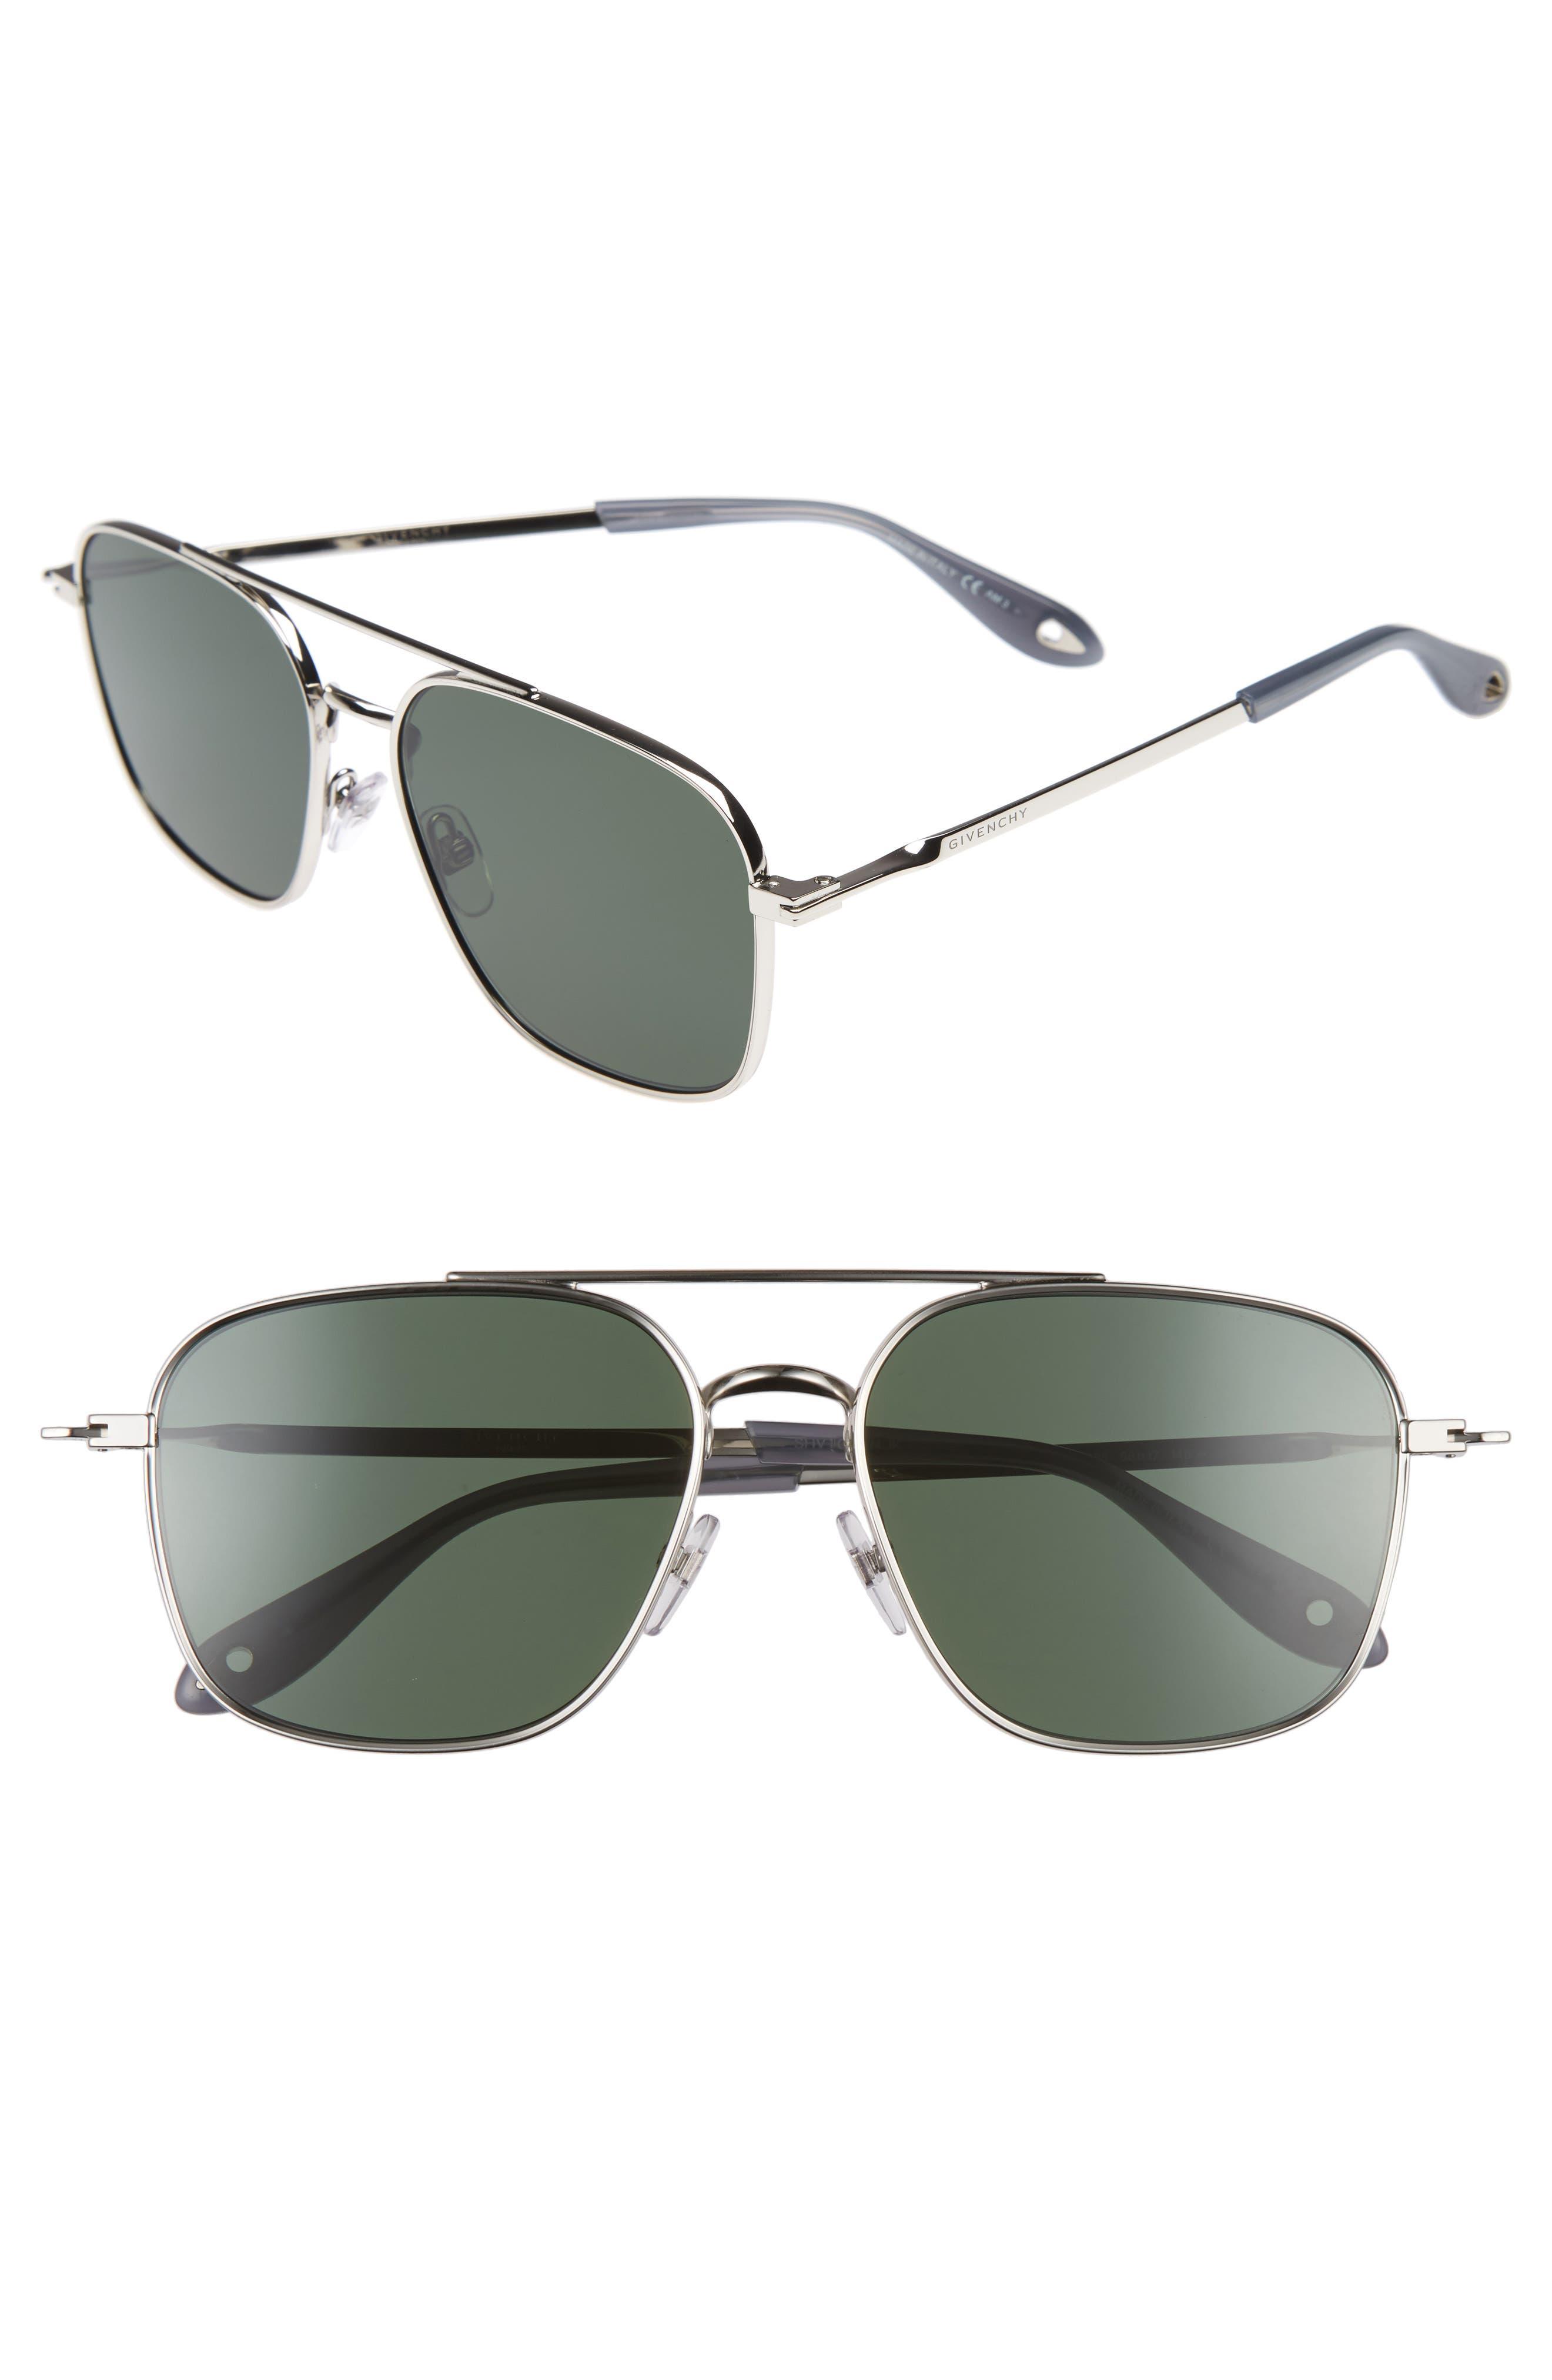 7033/S 58mm Sunglasses,                             Main thumbnail 1, color,                             041